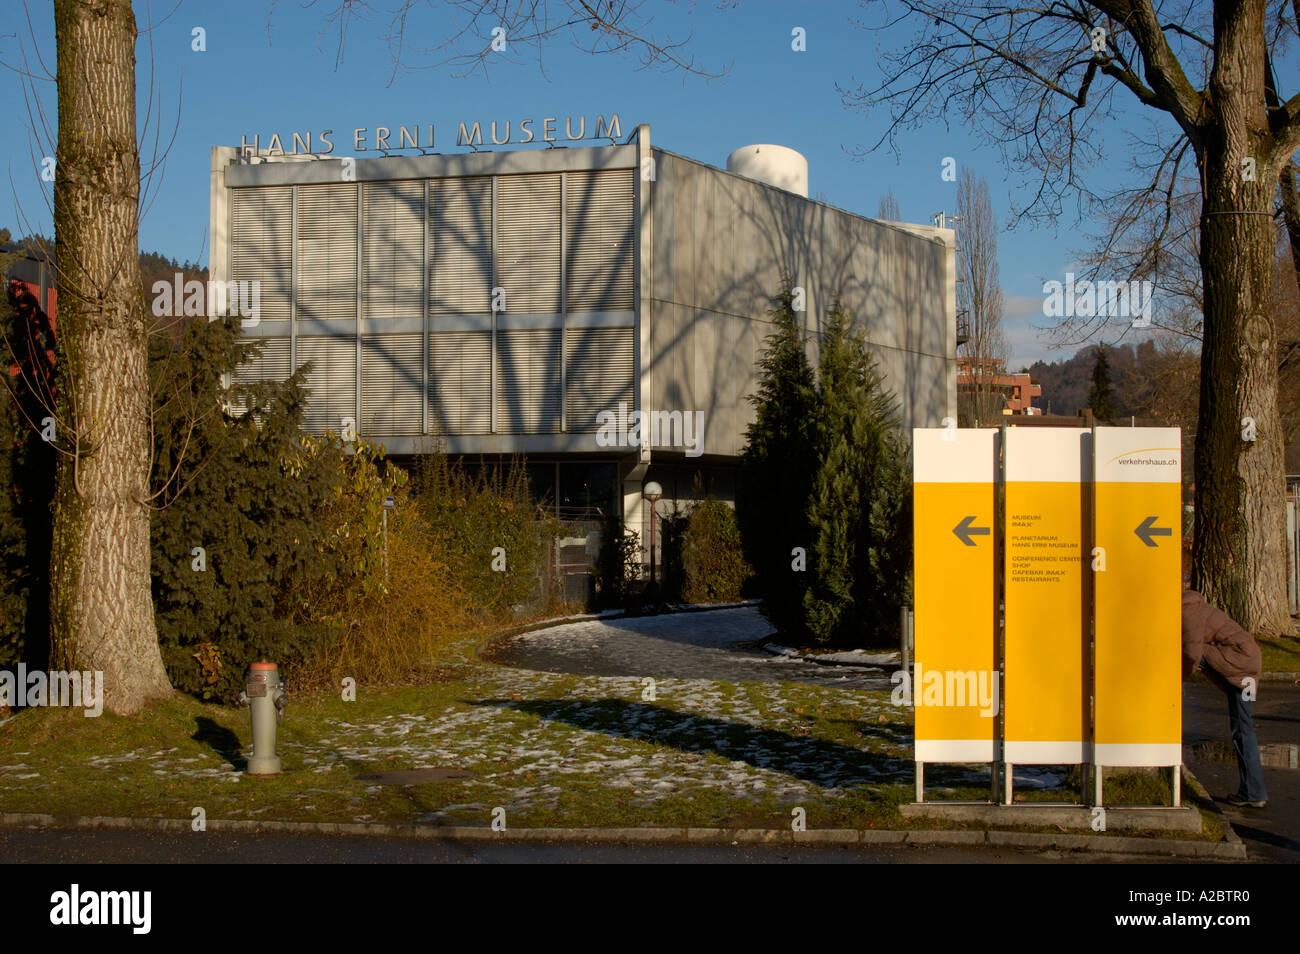 Museo hans erni en Lucerna, Suiza. ( C) uli nusko, CH-3012 Bern Foto de stock